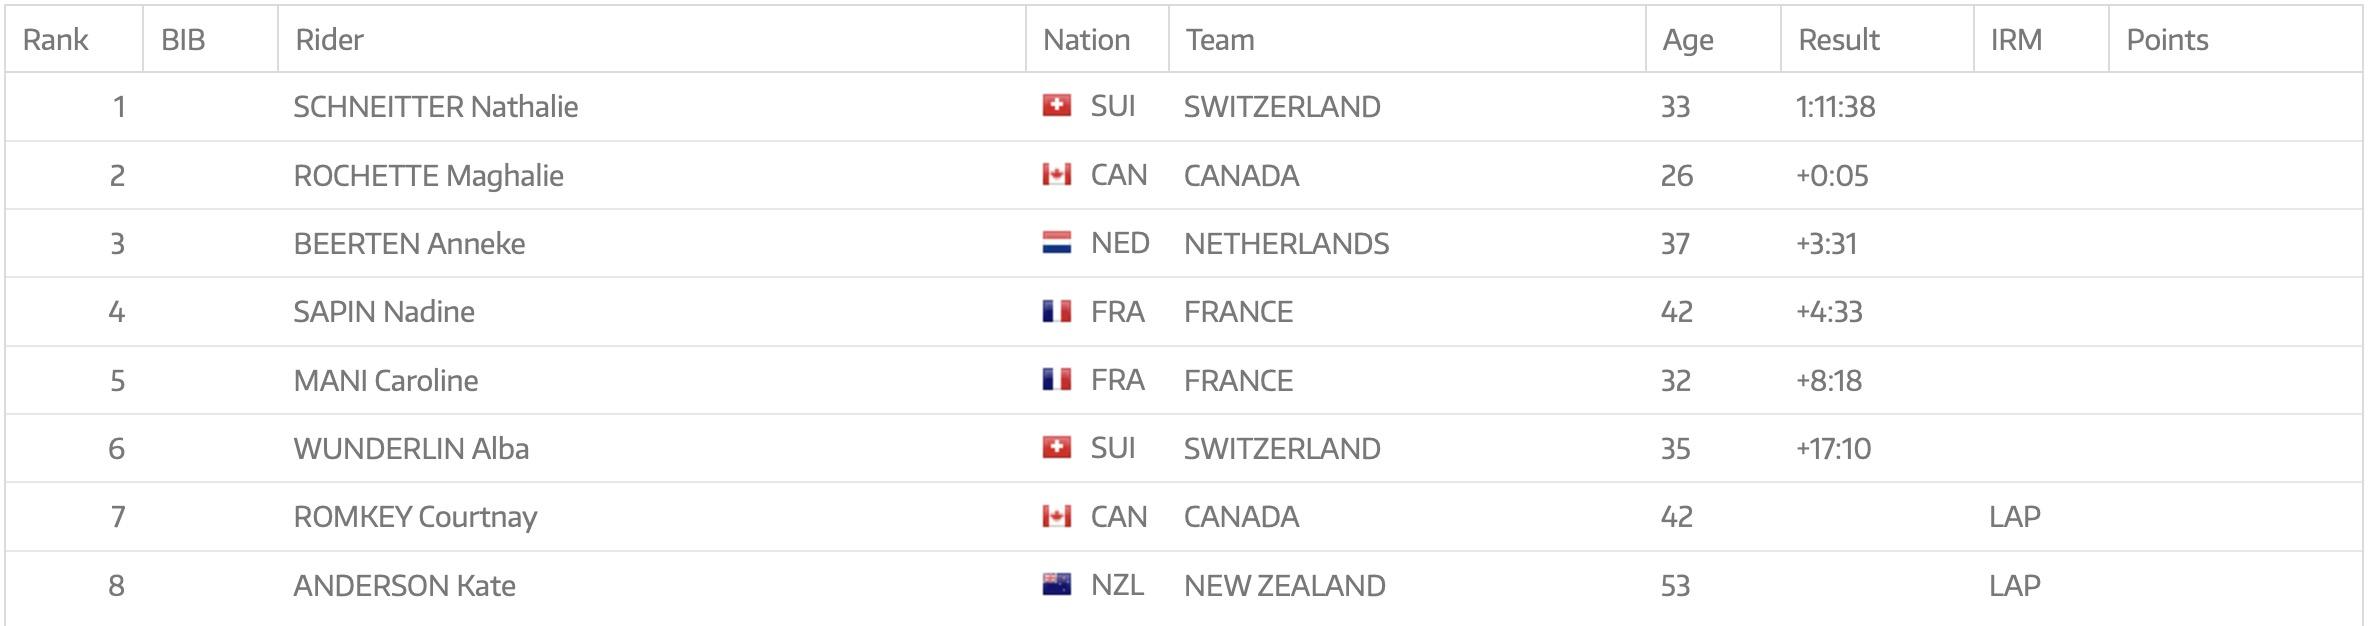 championnats monde uci e-MTB 2019 classement filles